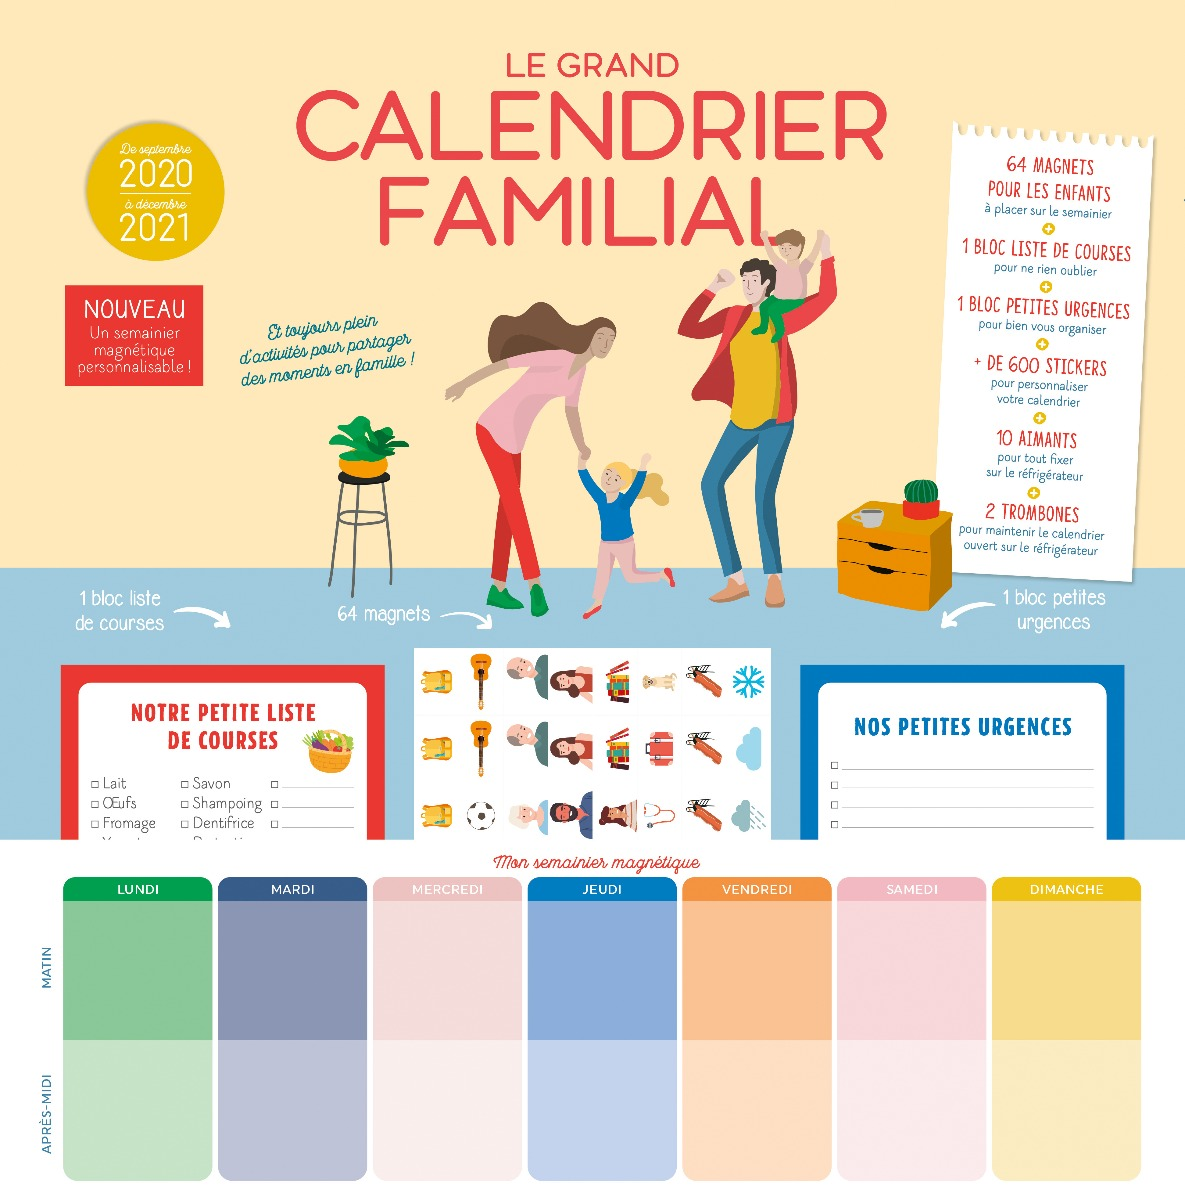 Couverture Le Grand Calendrier familial 2020-2021